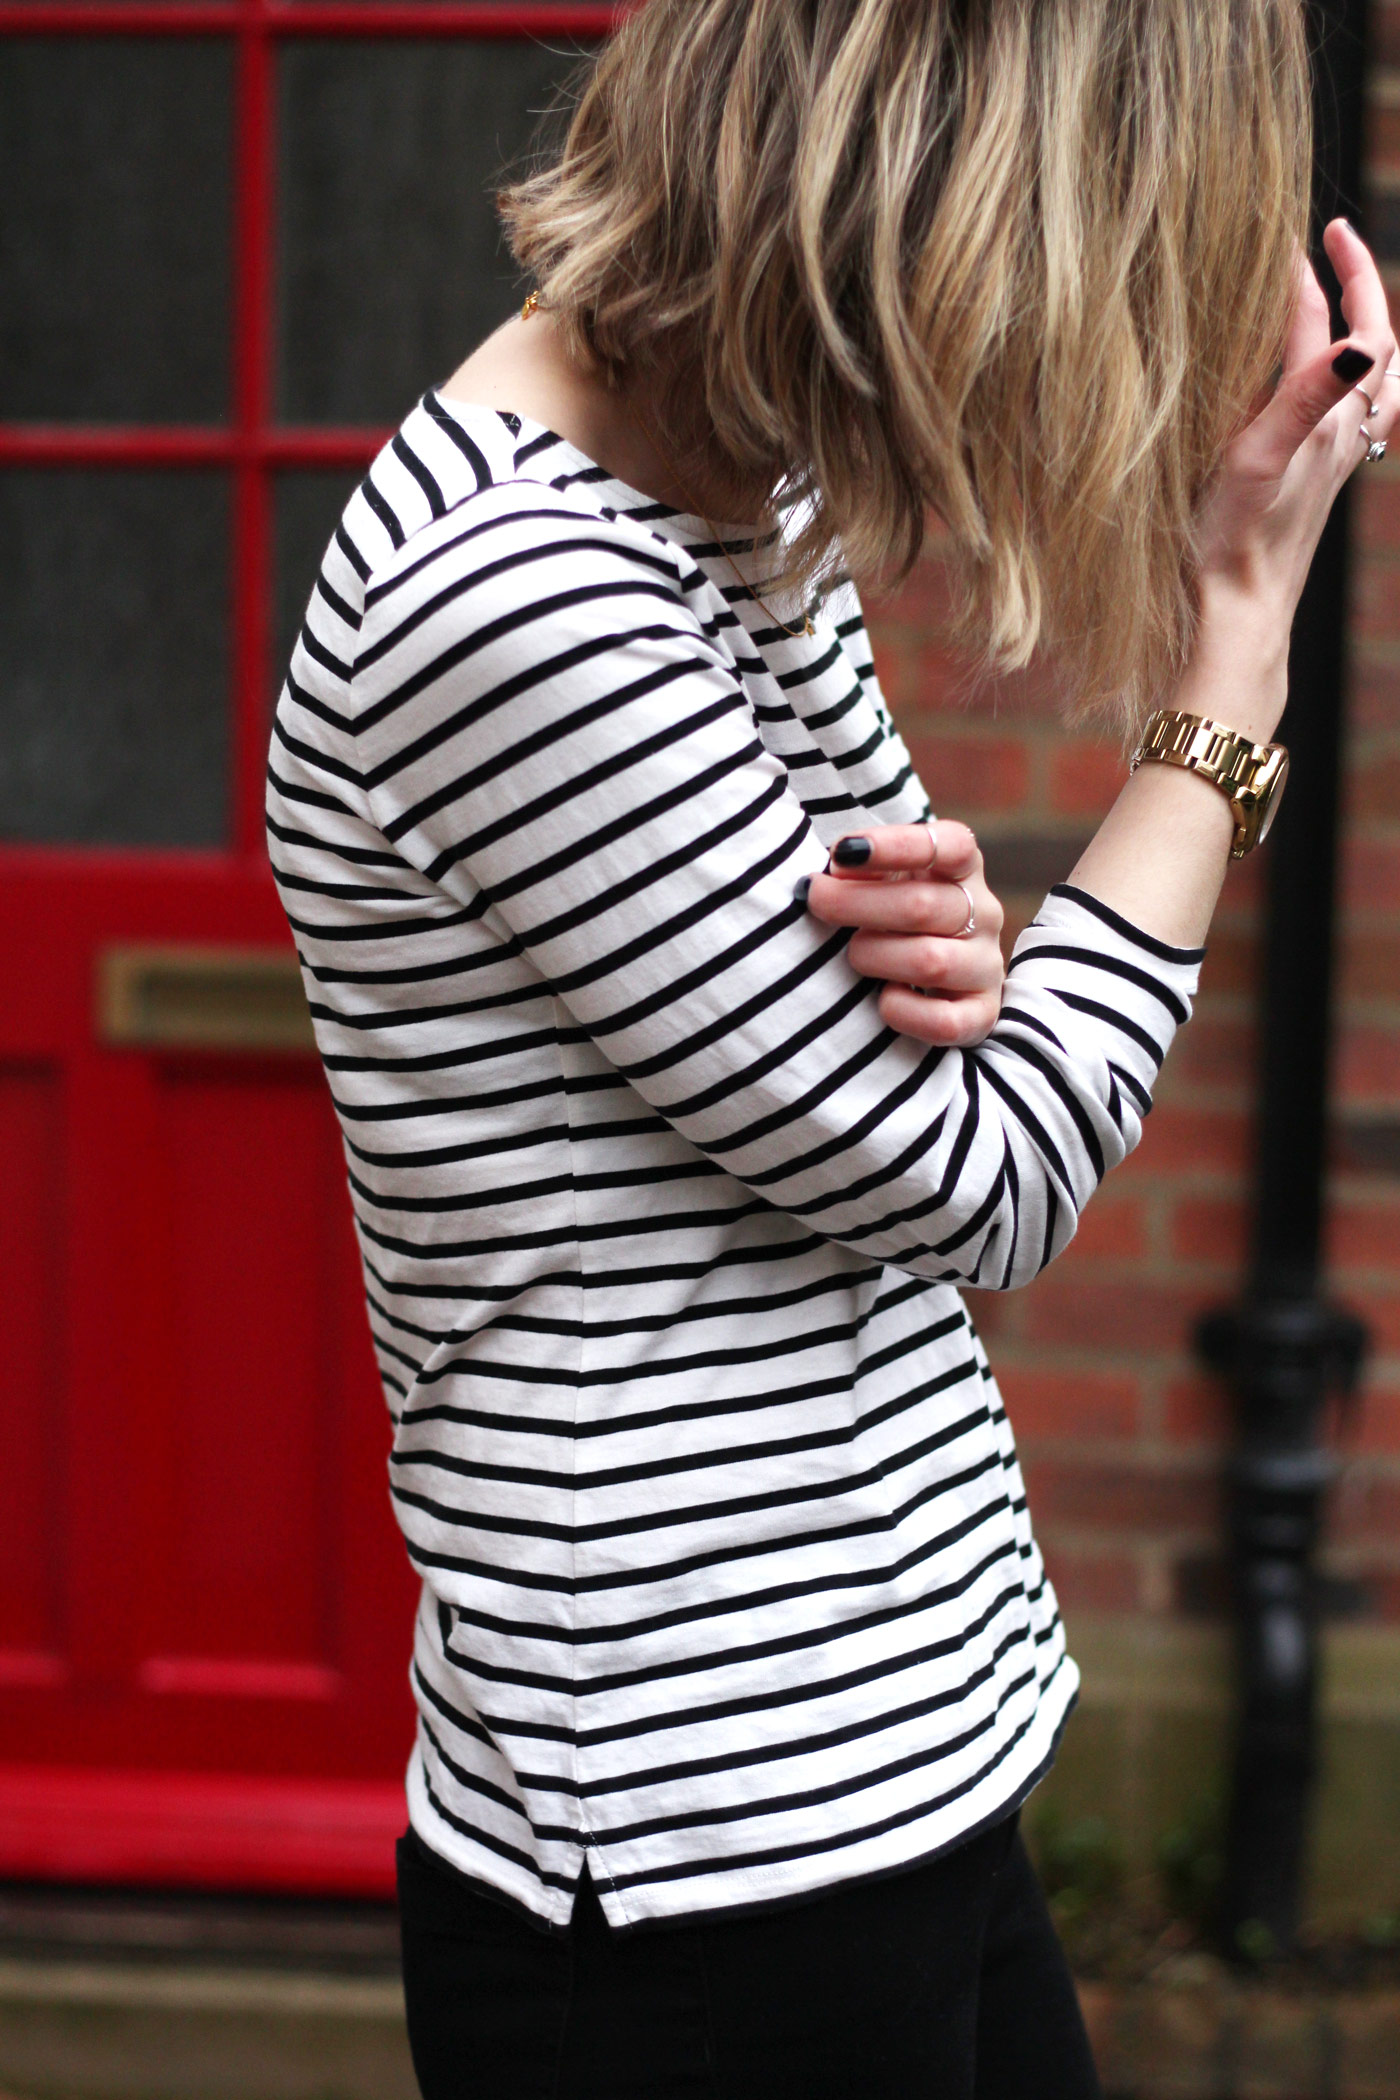 boden-breton-stripe-top-black-and-white-1